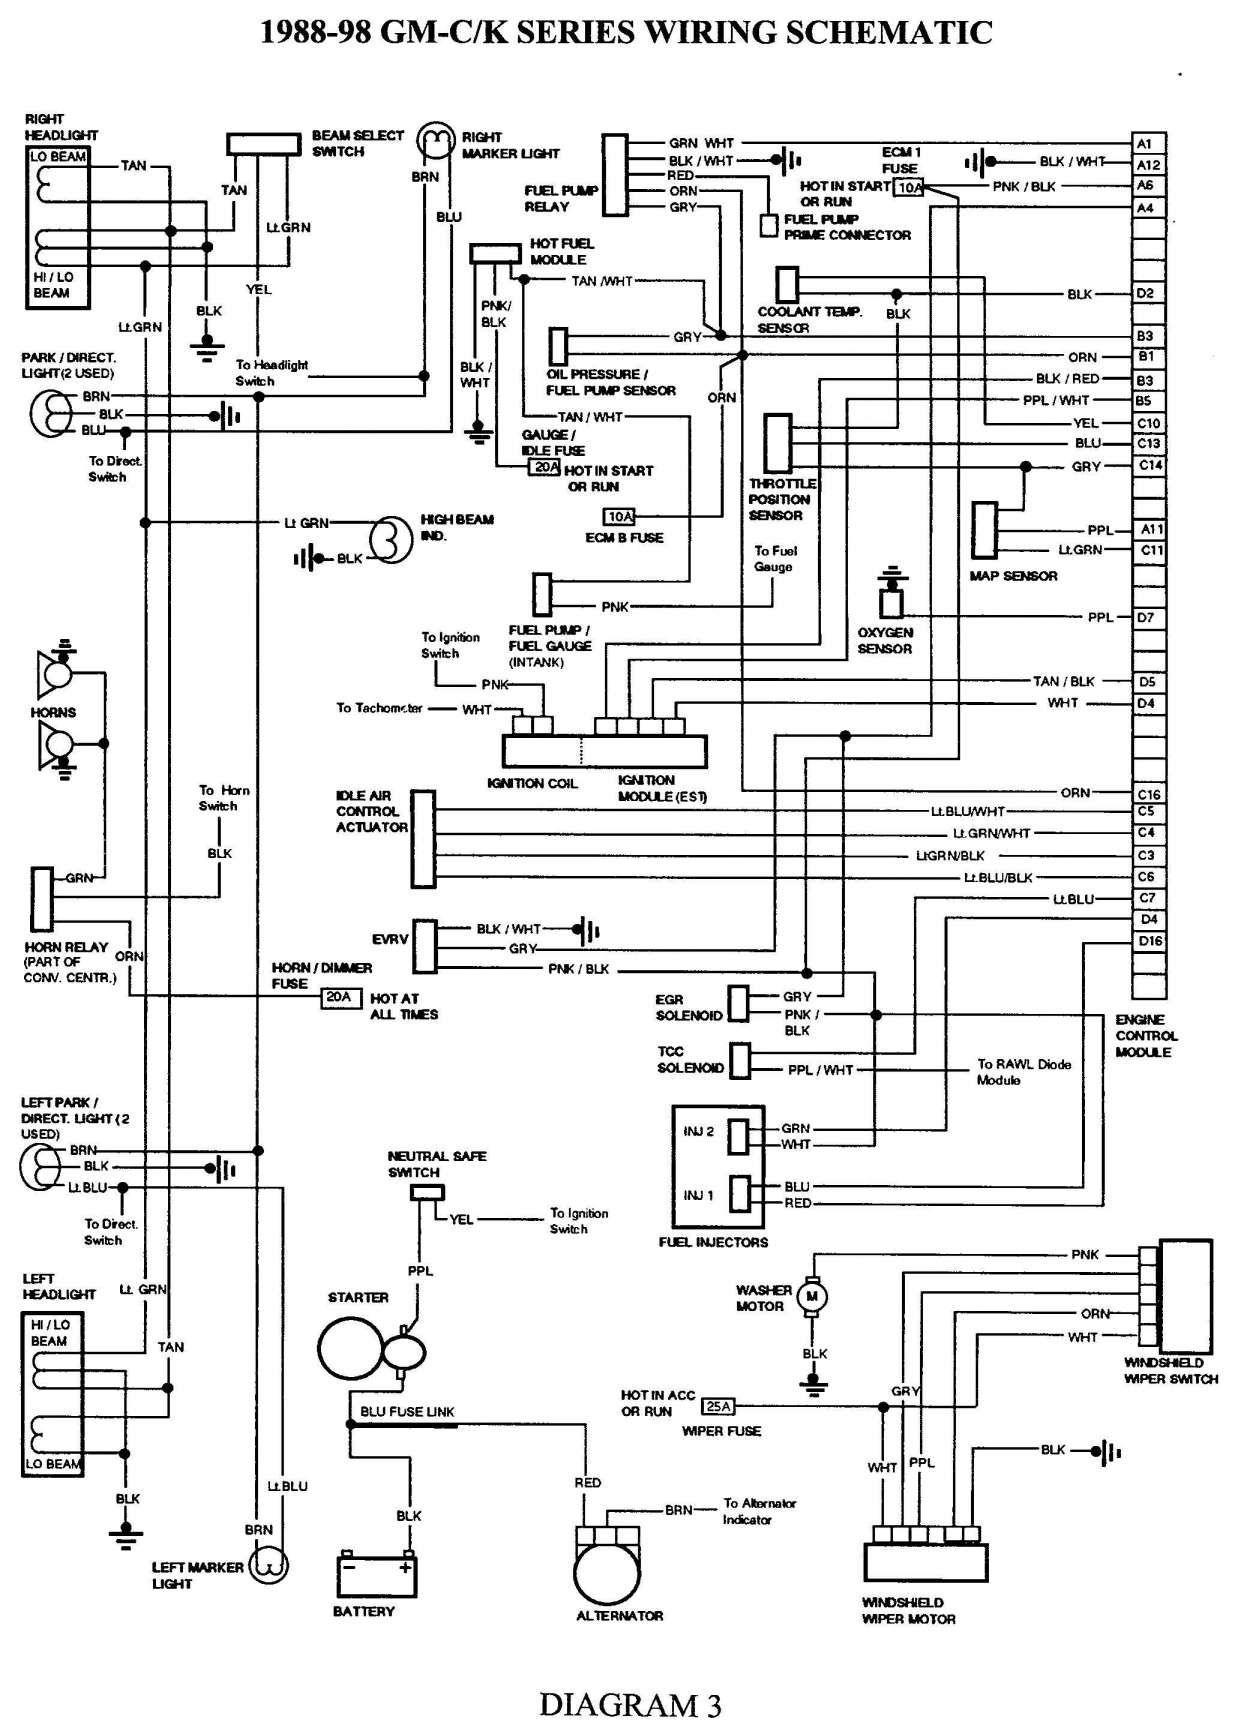 15 Ignition Coil Wiring Diagram Gmc Truck 1995 Truck Diagram In 2020 Electrical Diagram Trailer Wiring Diagram 1998 Chevy Silverado